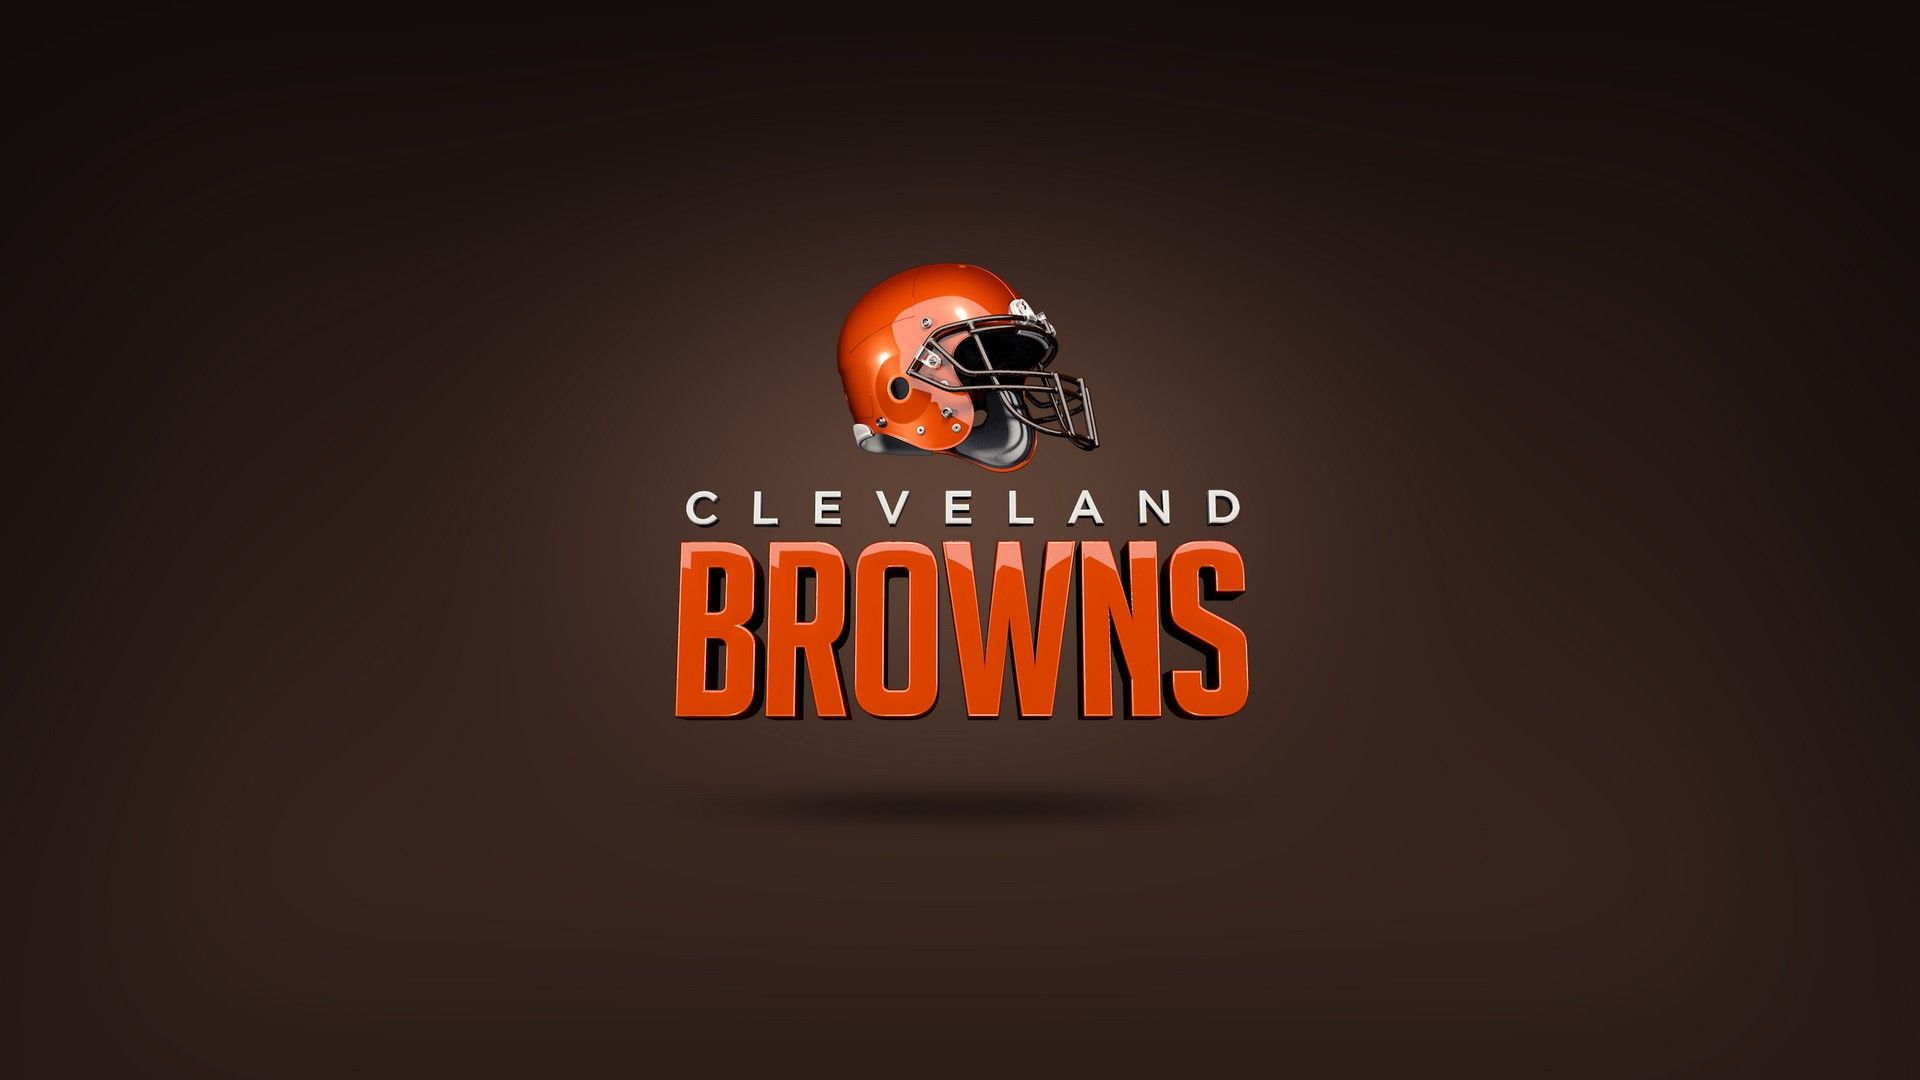 Windows Wallpaper Cleveland Browns Cleveland Browns